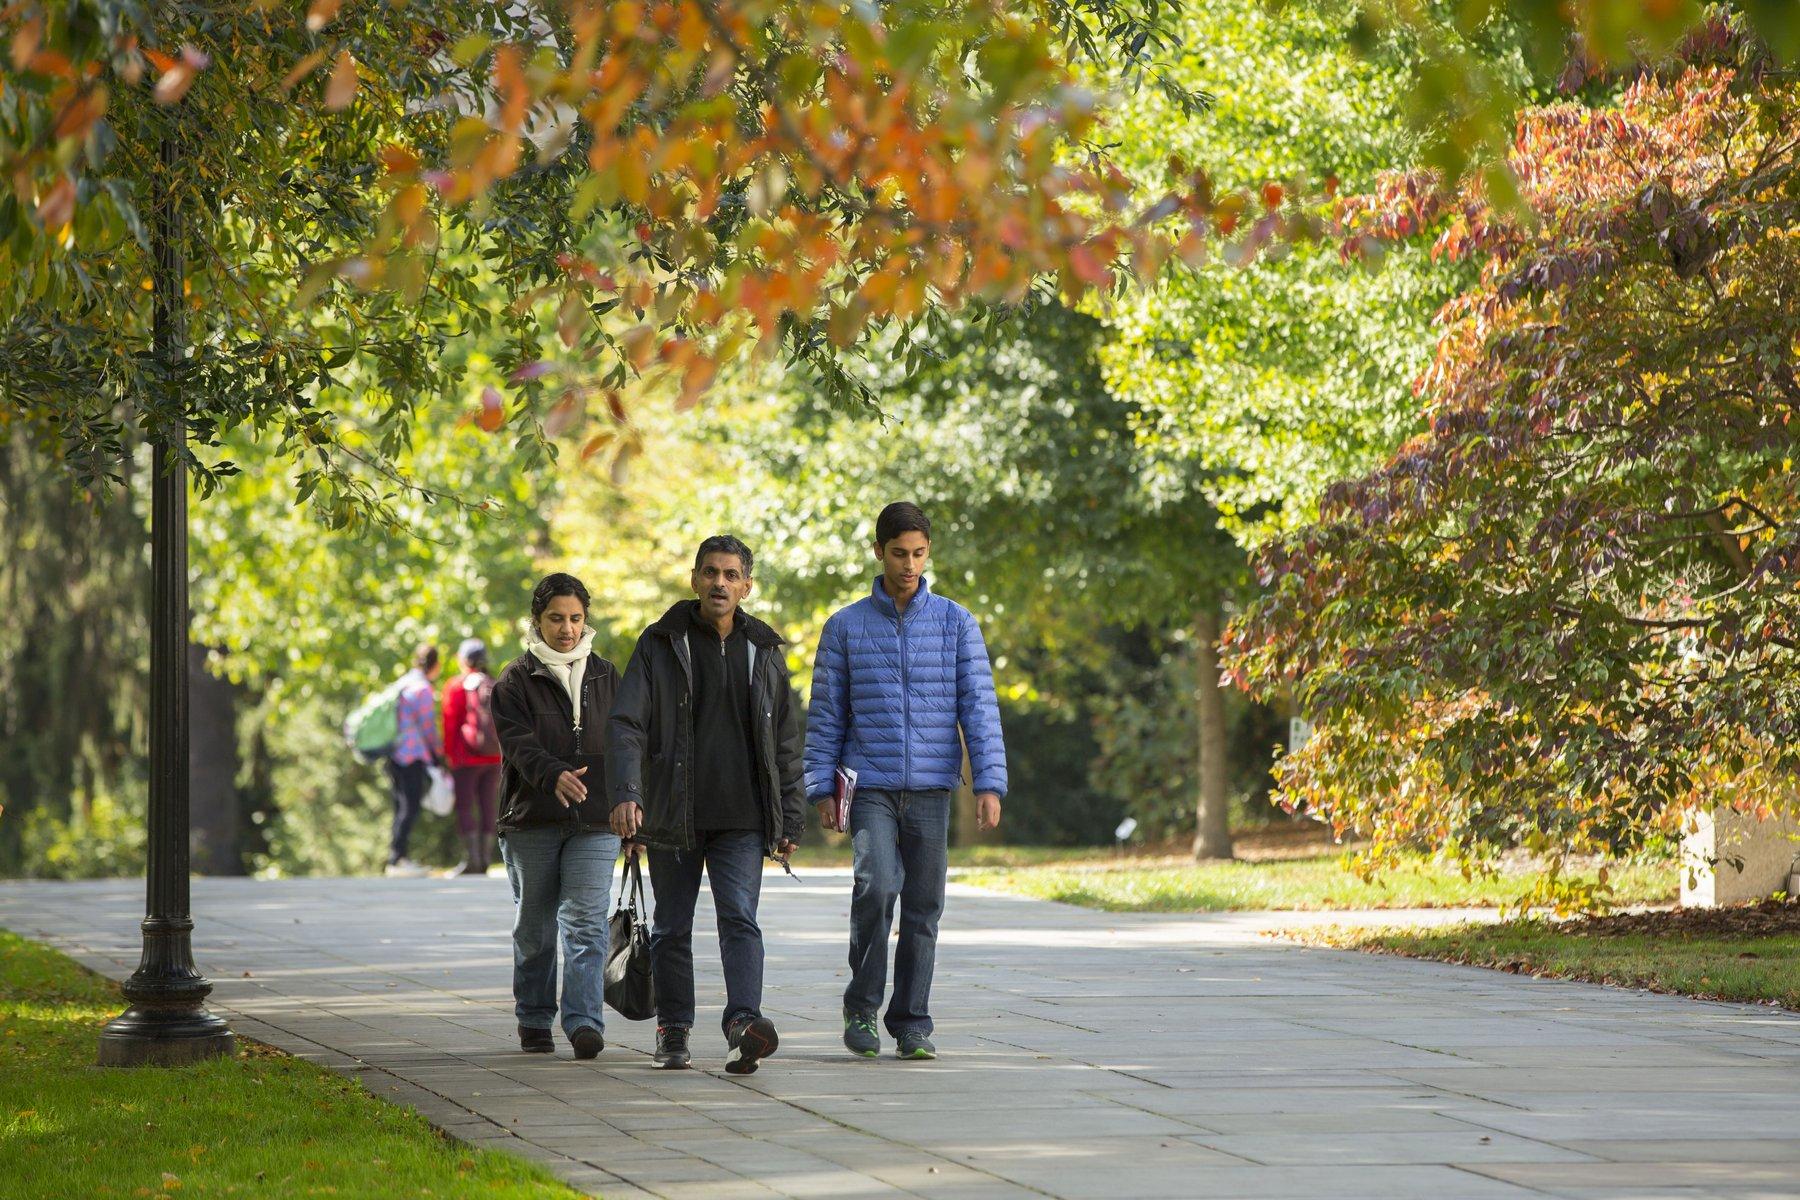 A family walks through campus